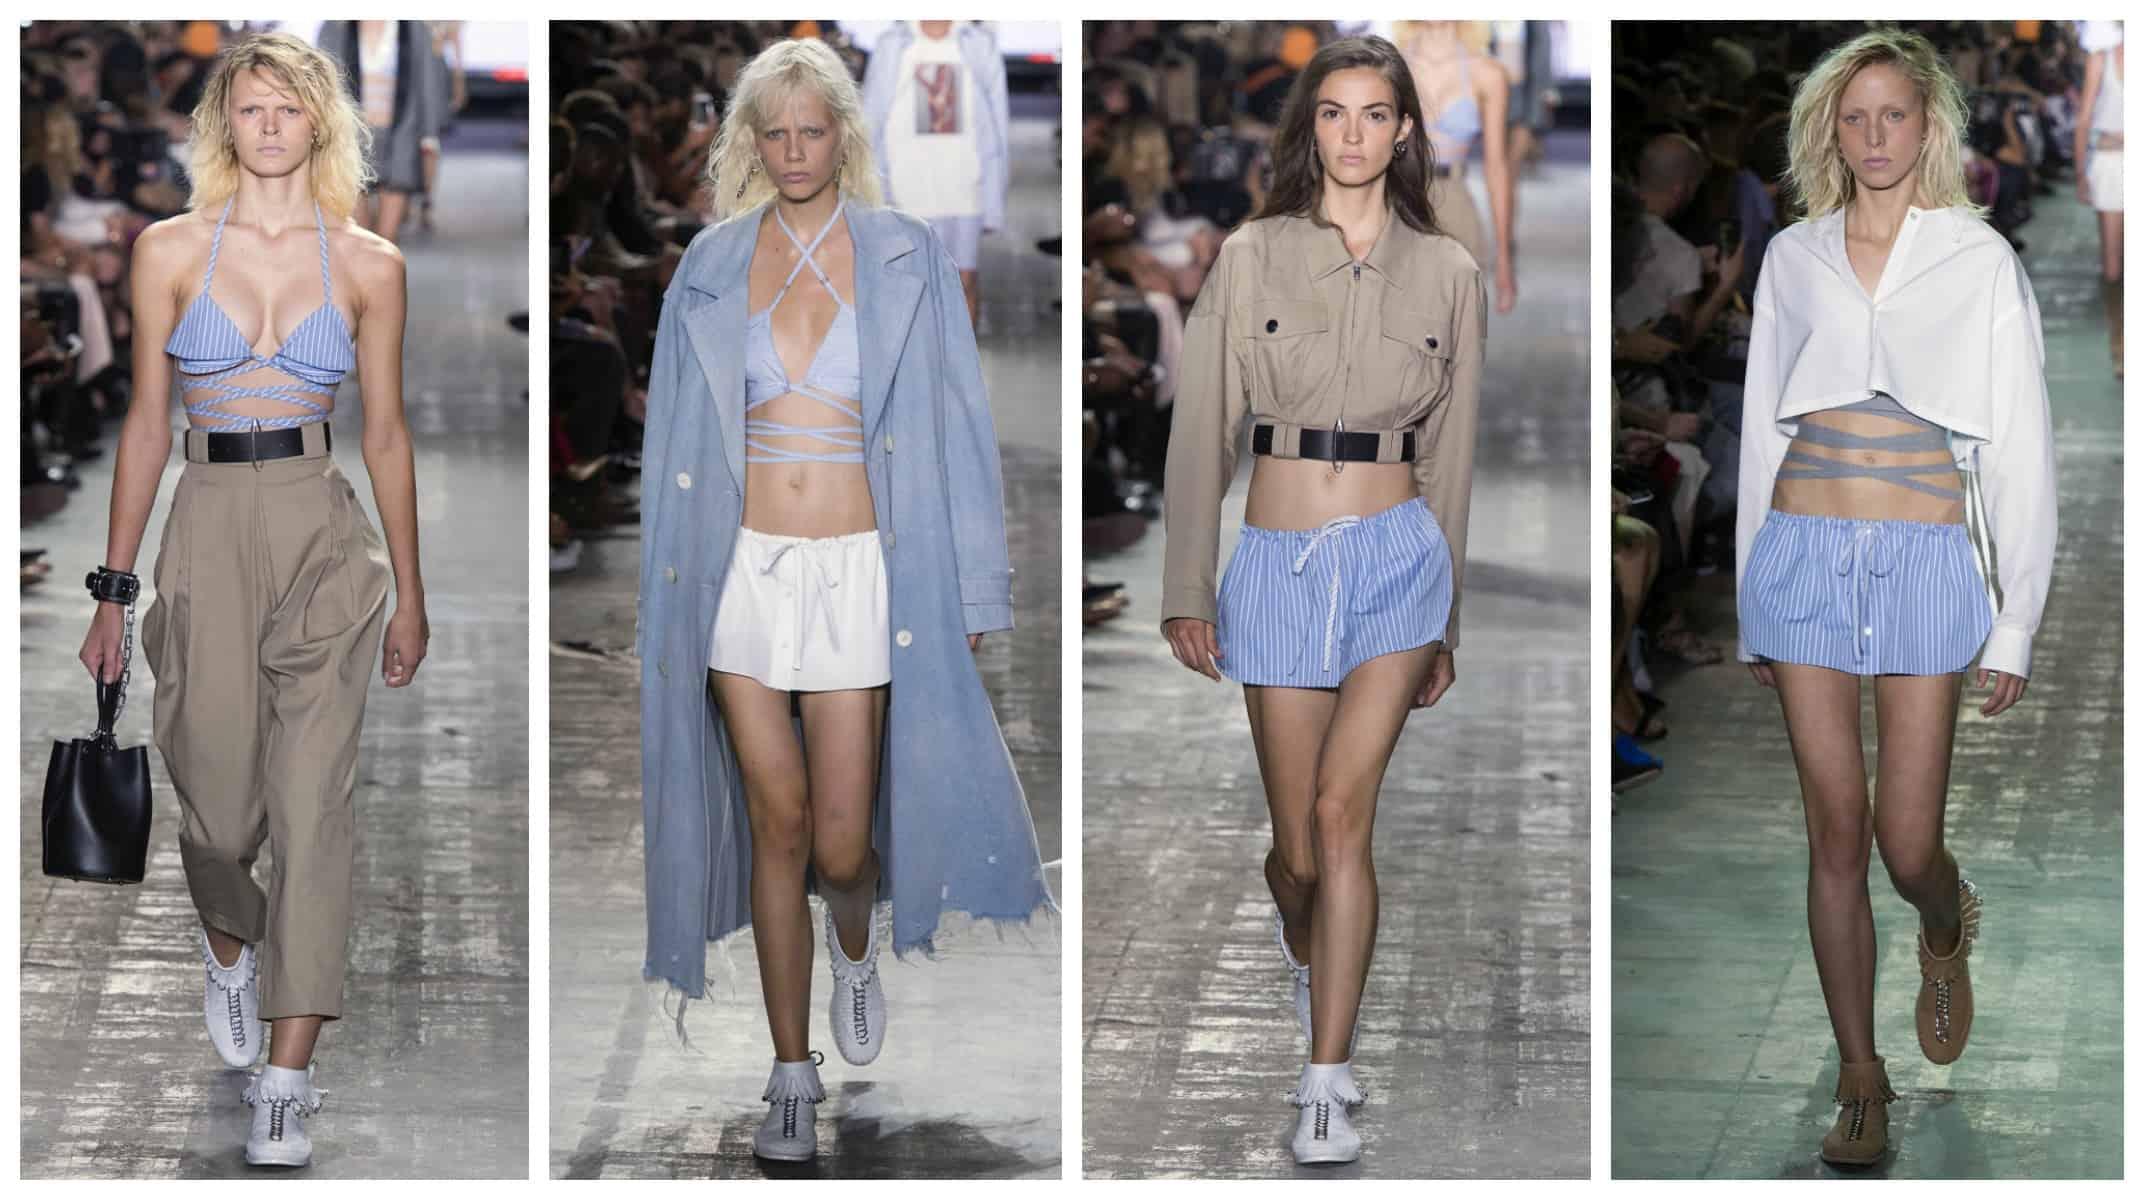 New York Fashion Week Spring 2017 - Alexander Wang